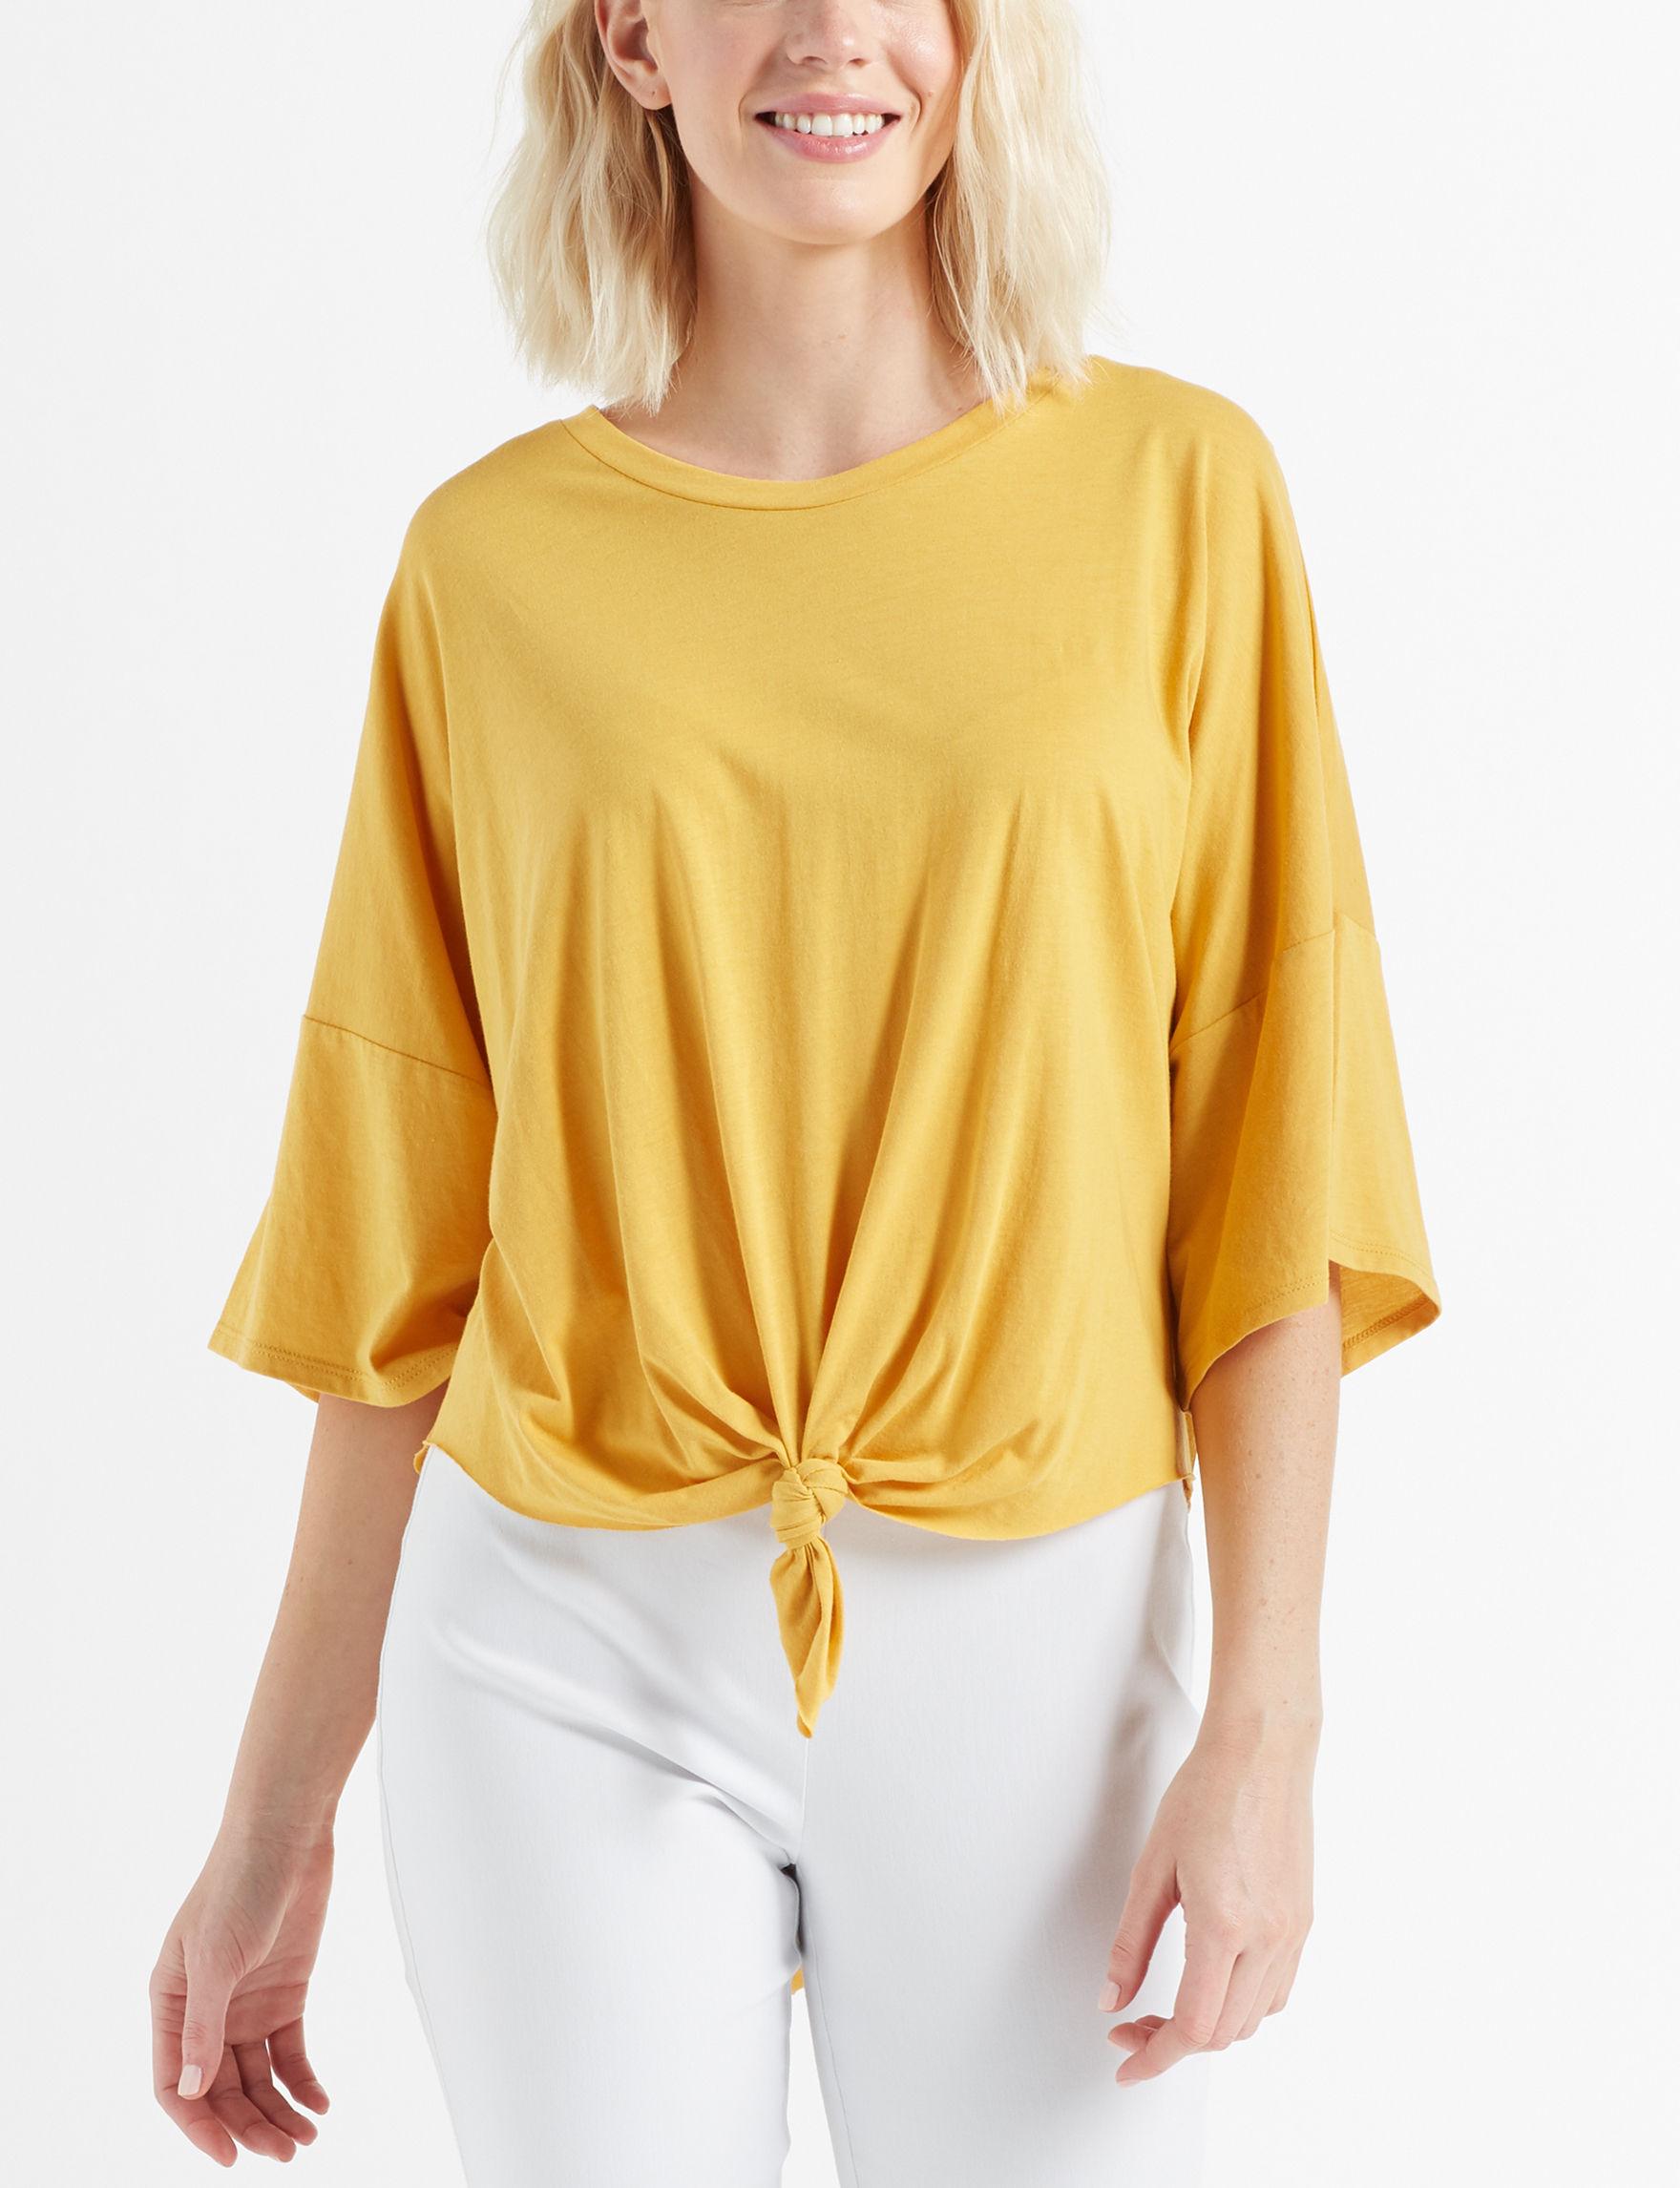 Signature Studio Yellow Shirts & Blouses